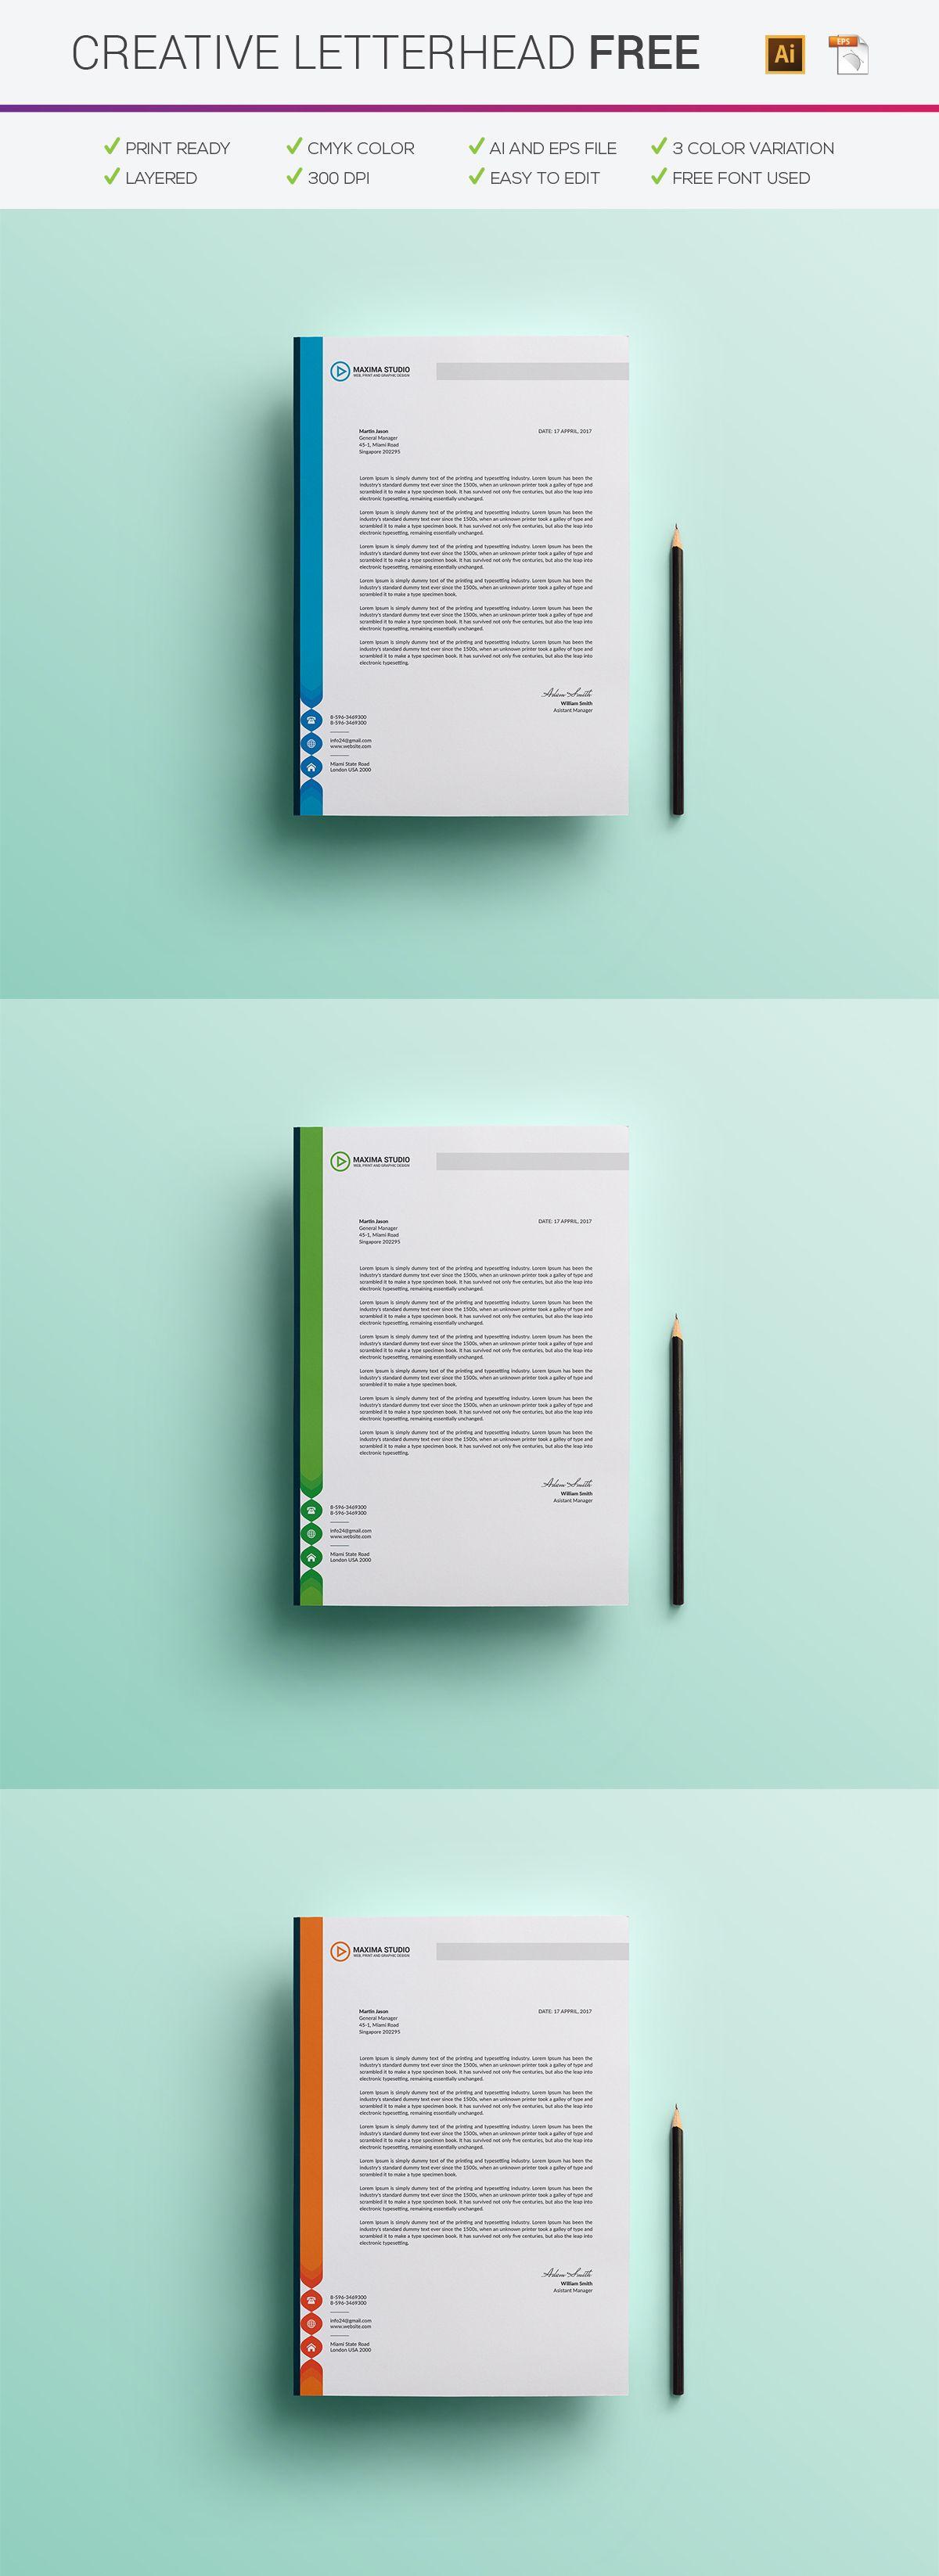 free creative letterhead on behance letterhead design letterhead